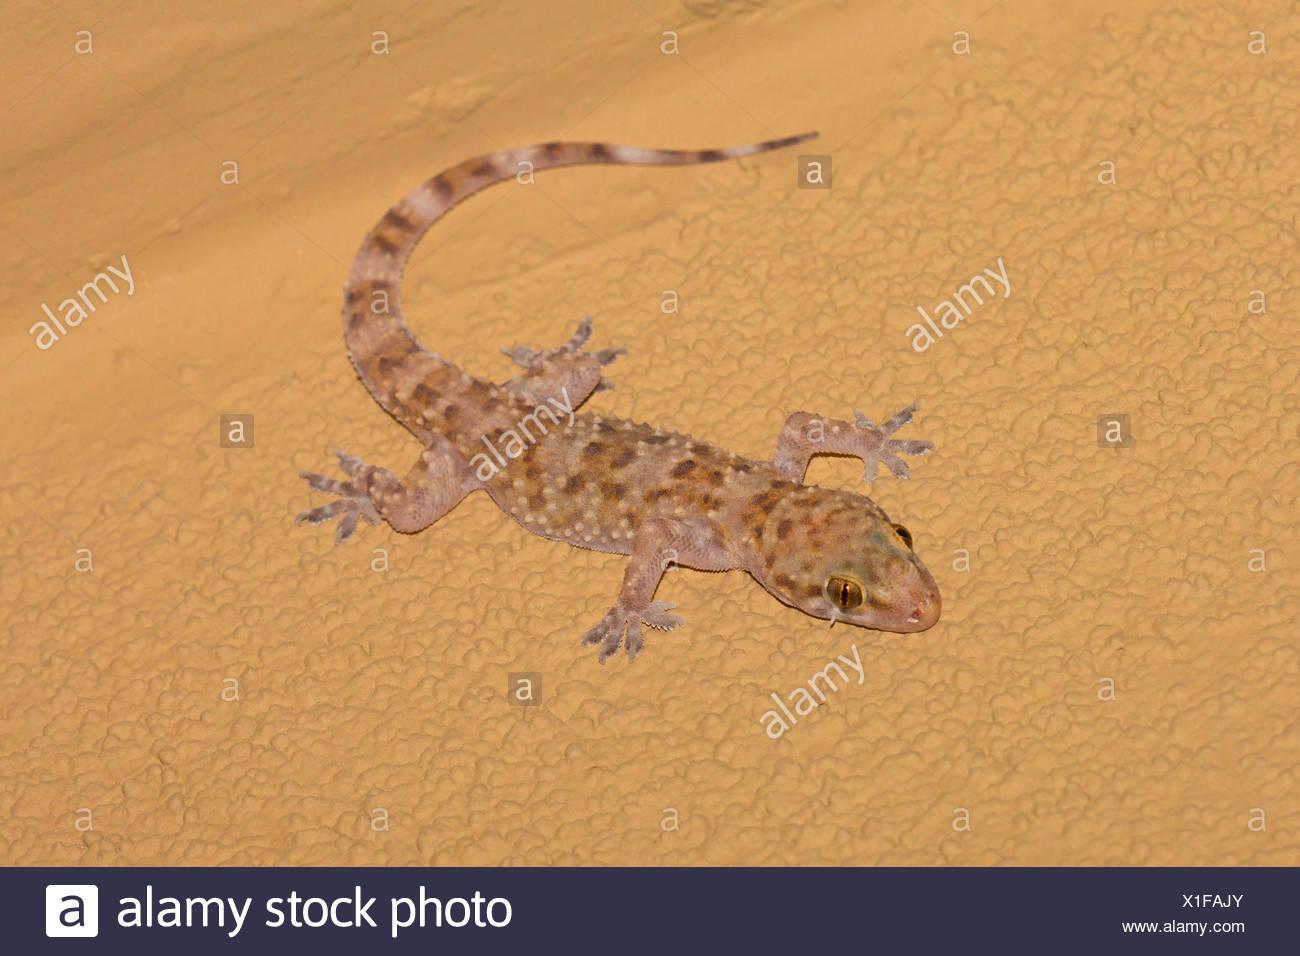 Turco, Mediterráneo gecko gecko (Hemidactylus turcicus), se sienta en un revestimiento, Arizona, EE.UU. Imagen De Stock